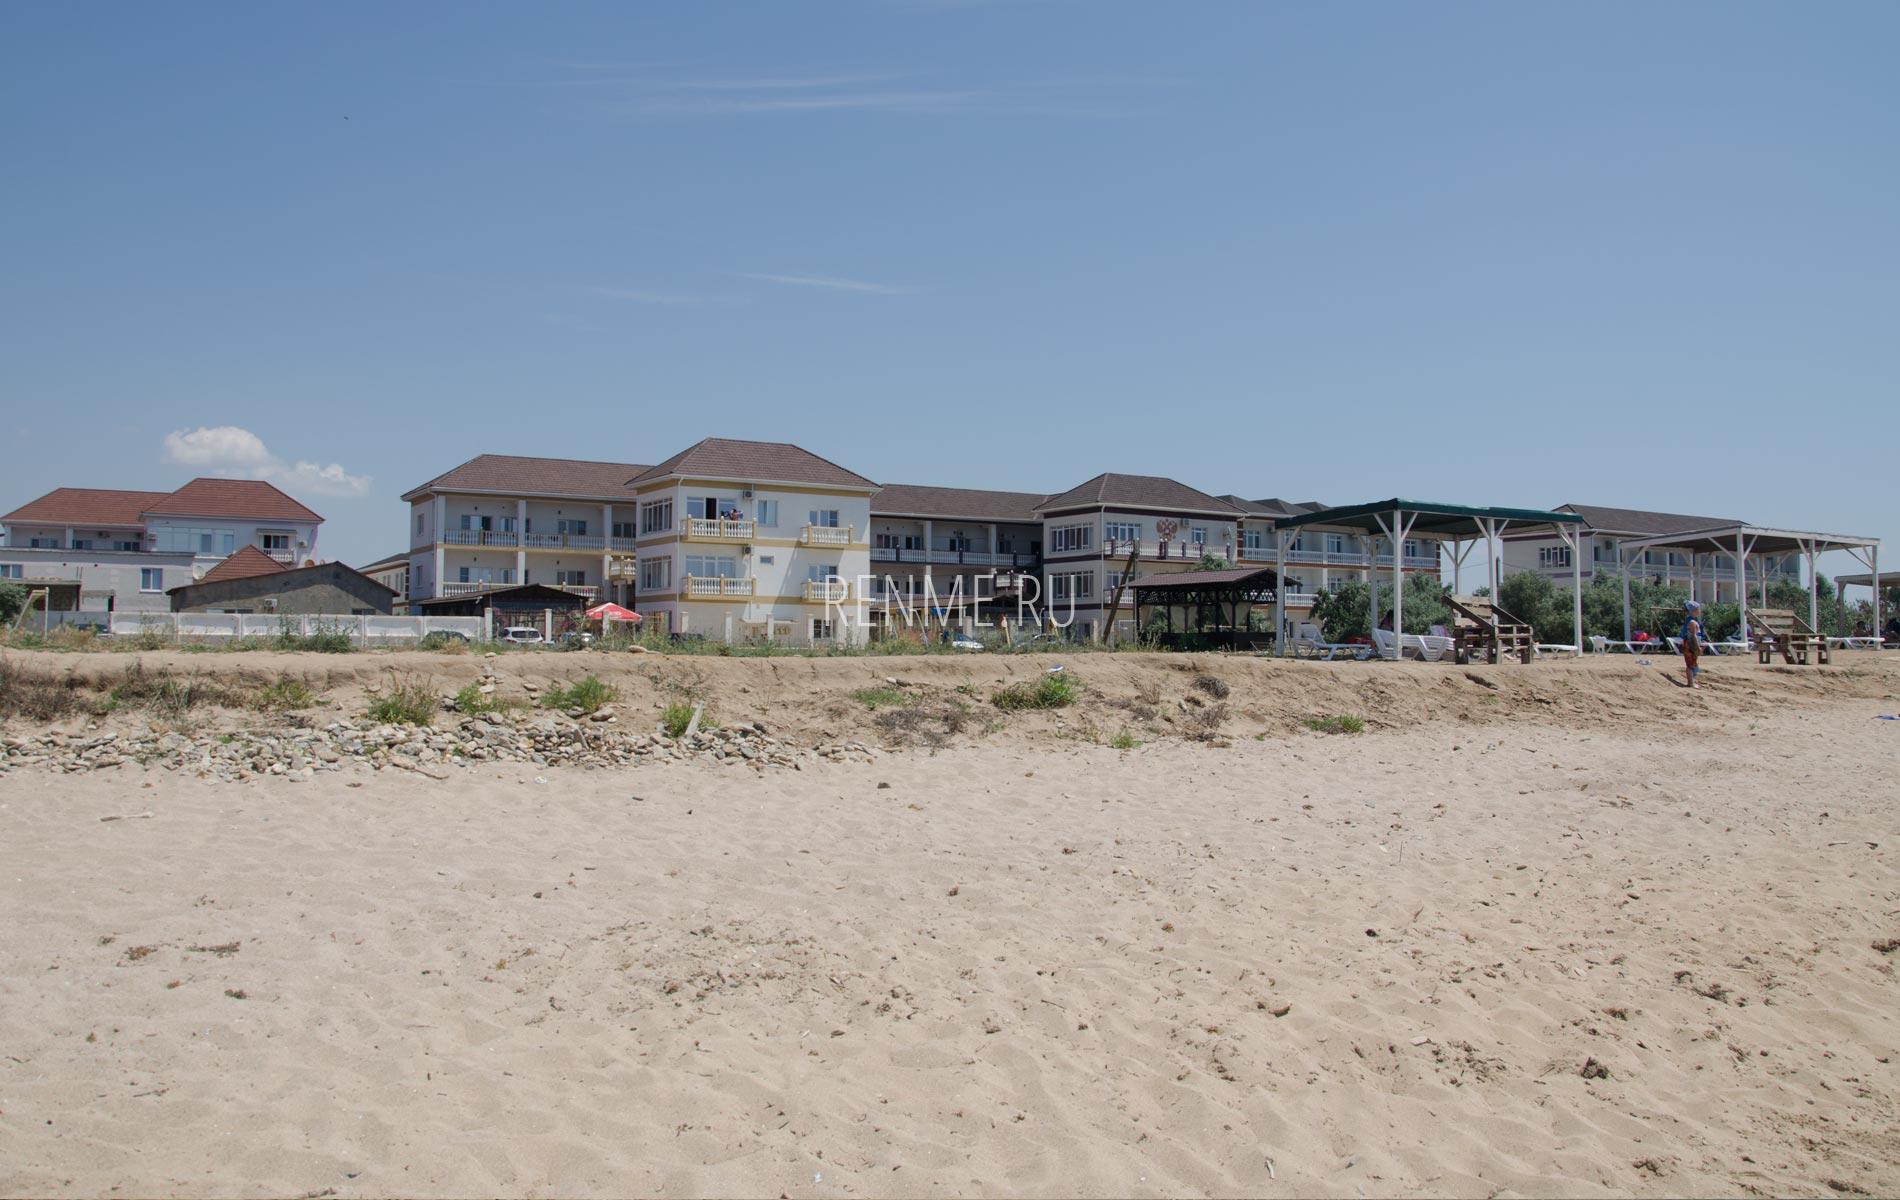 Фото Союз-2004 с пляжа. Фото Заозёрного